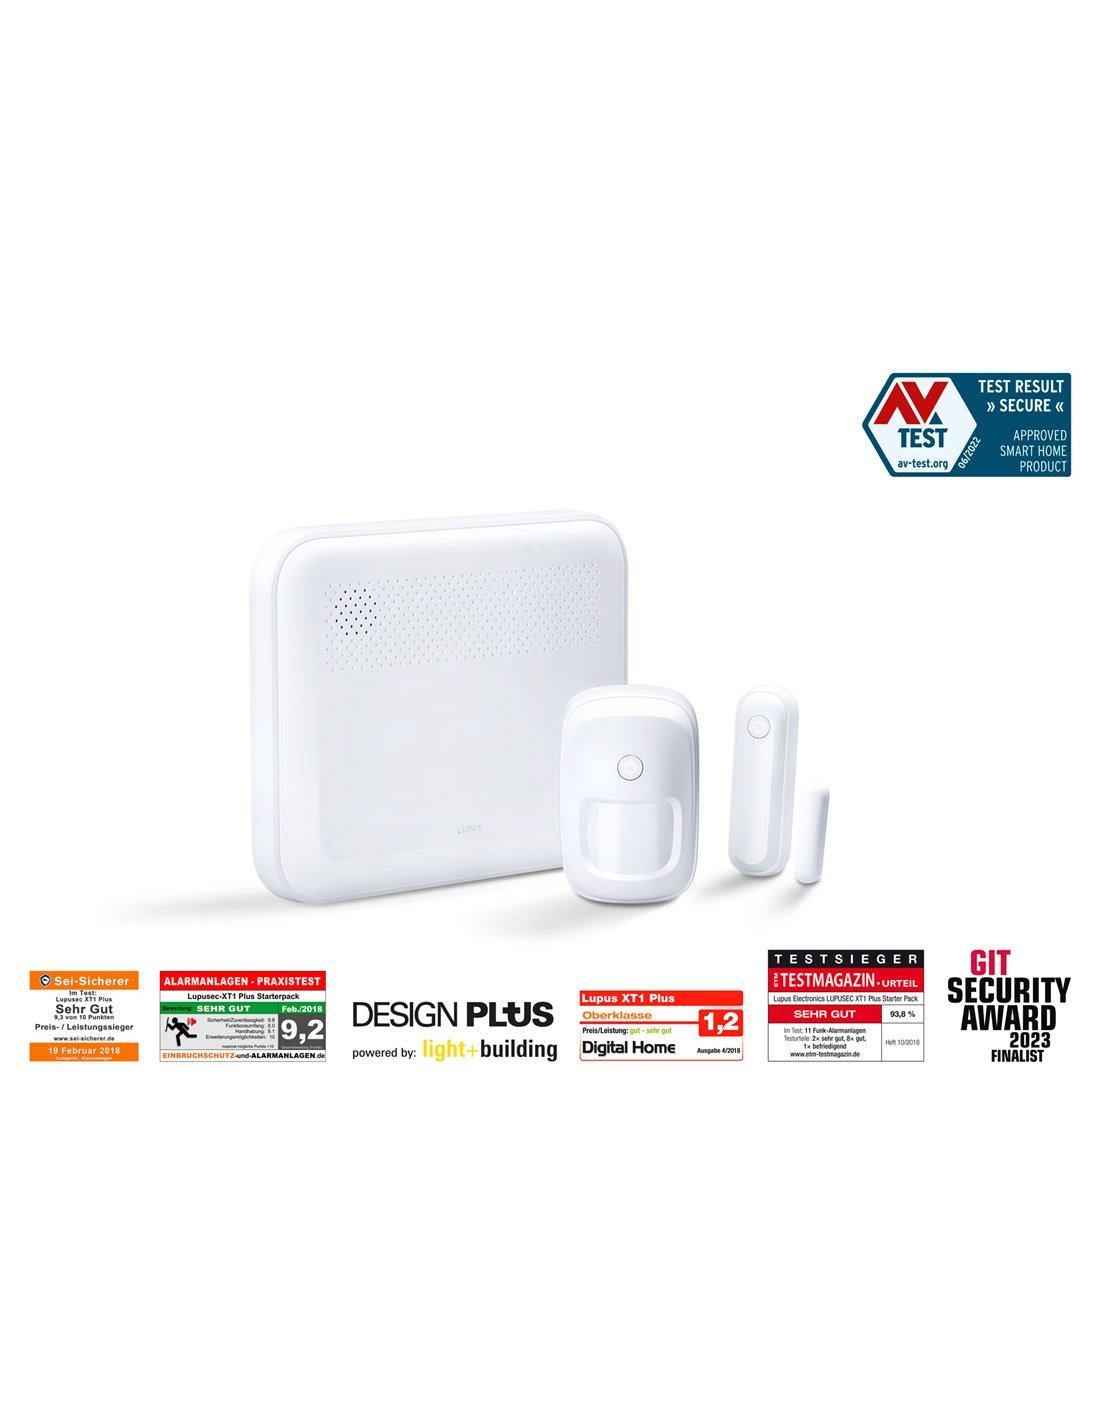 LUPUSEC XT1 PLUS - Starter Pack LU12112